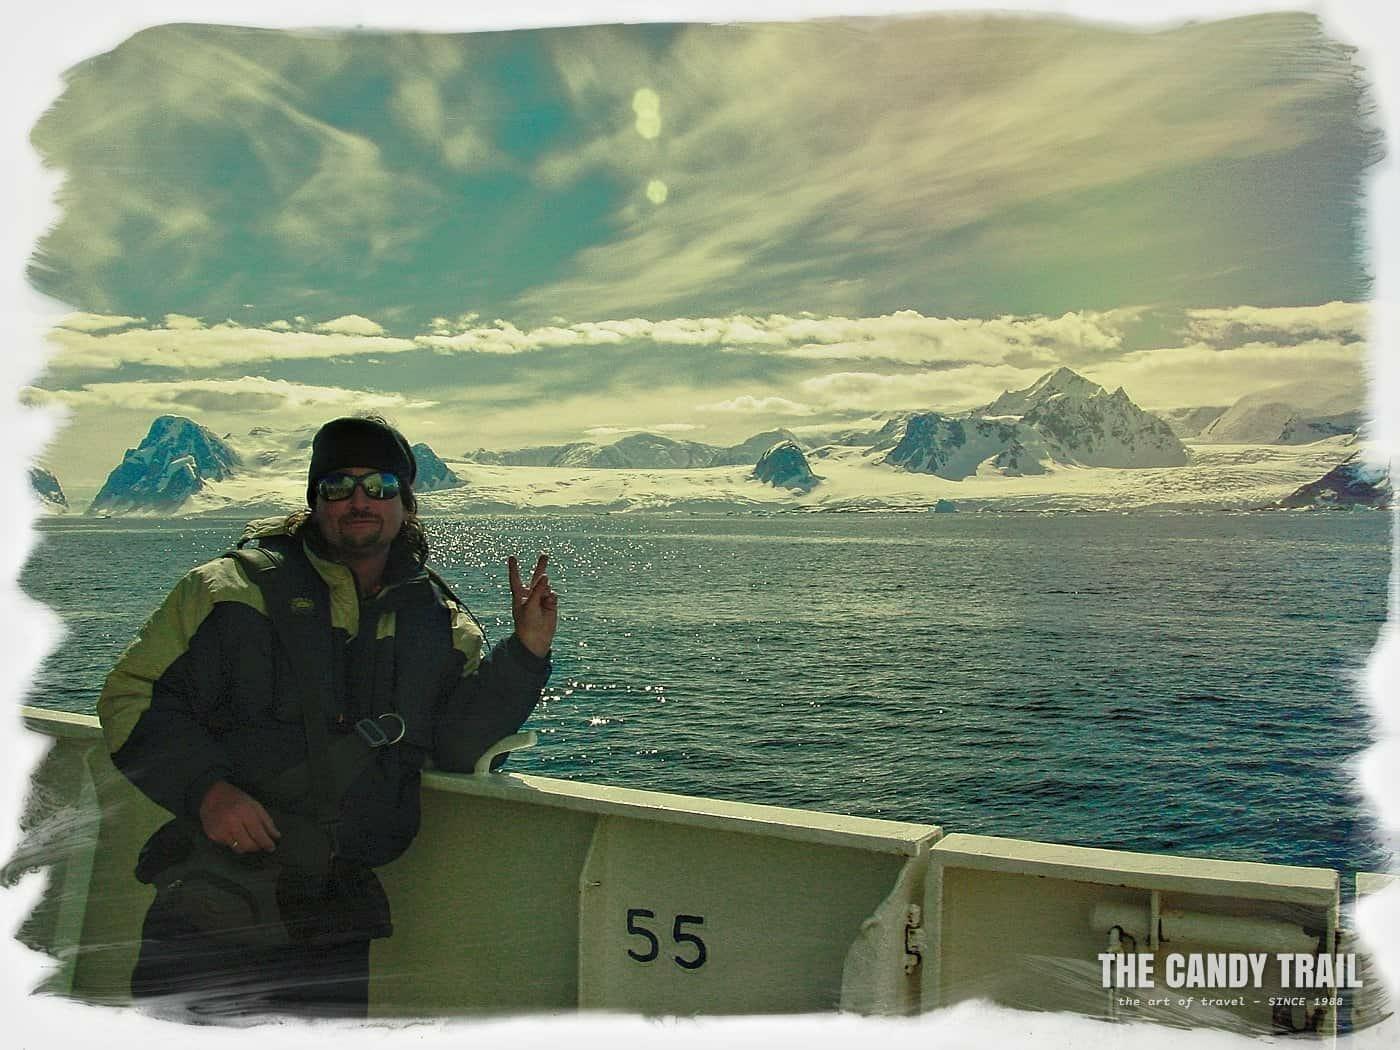 Michael Robert Powell long term traveler in Antarctica 2003